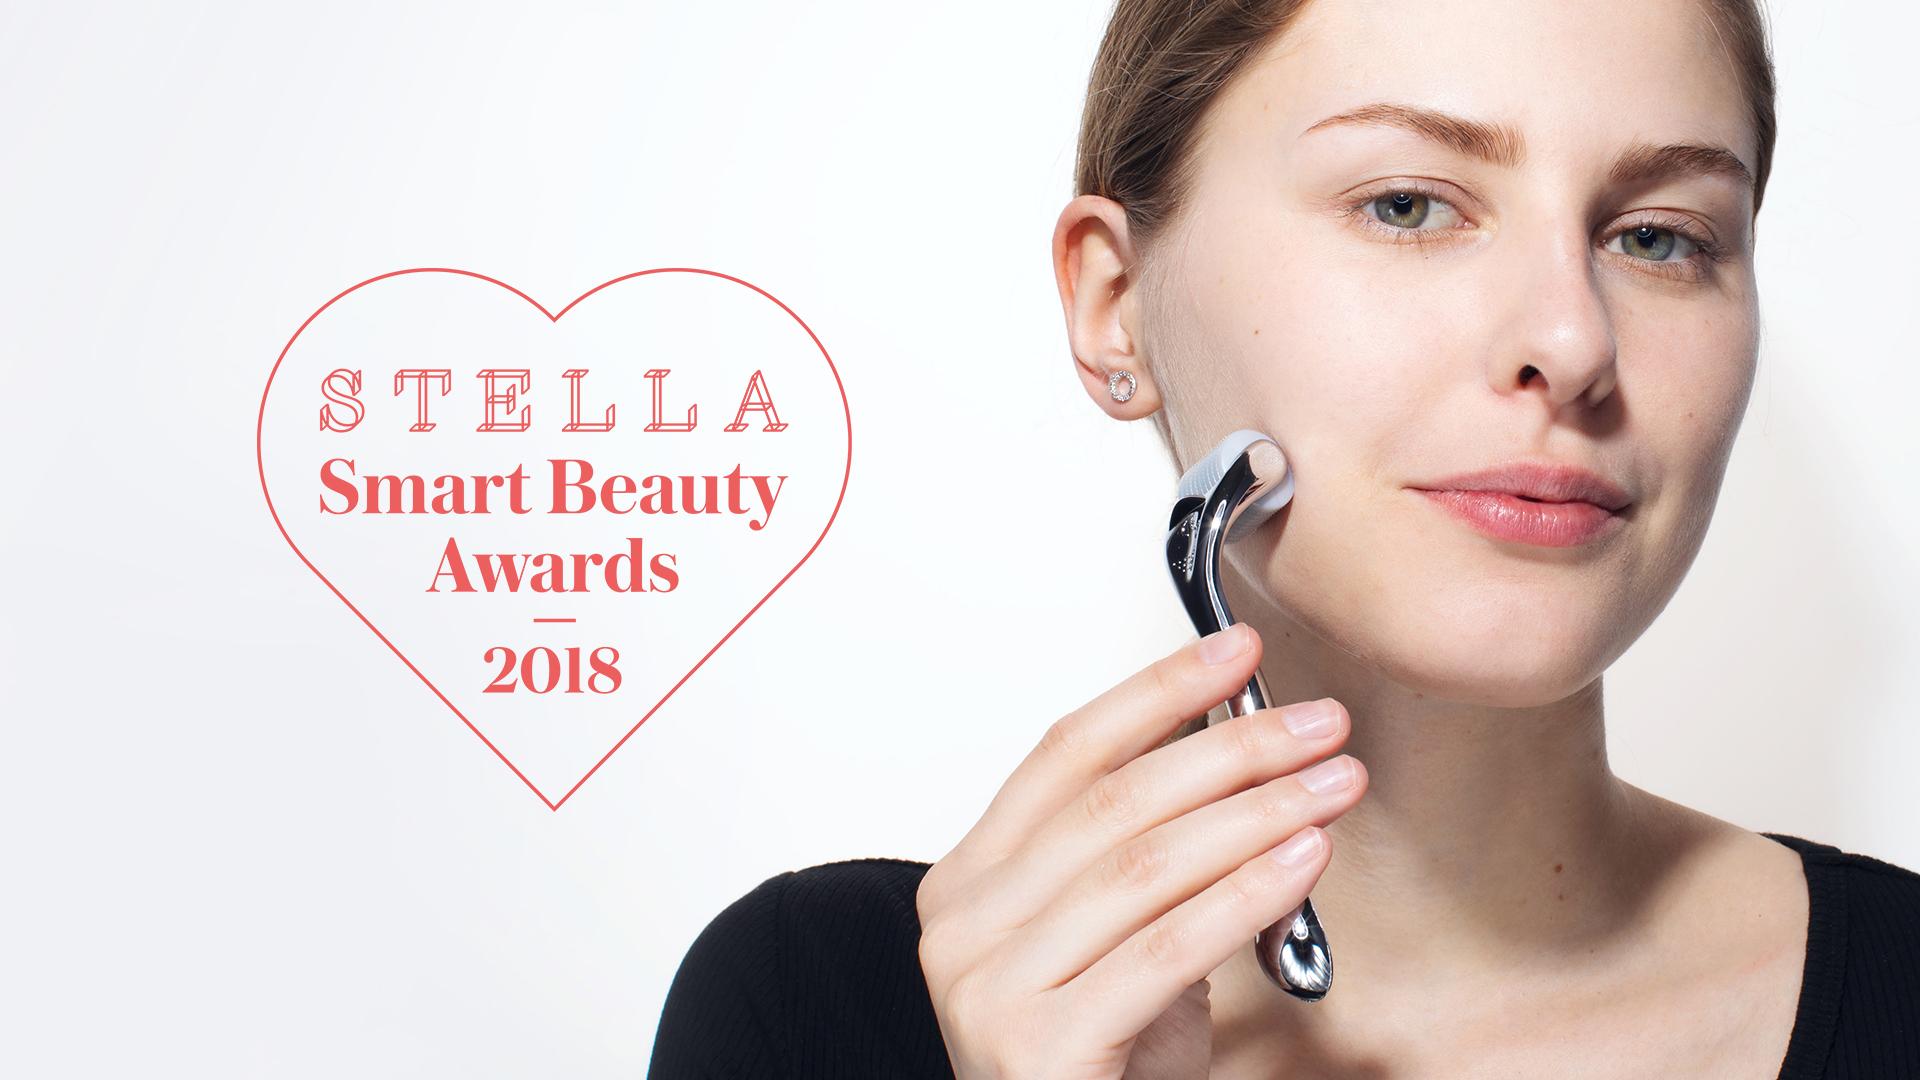 Winner of Best DIY Buy at the Stella Smart Beauty Awards 2018